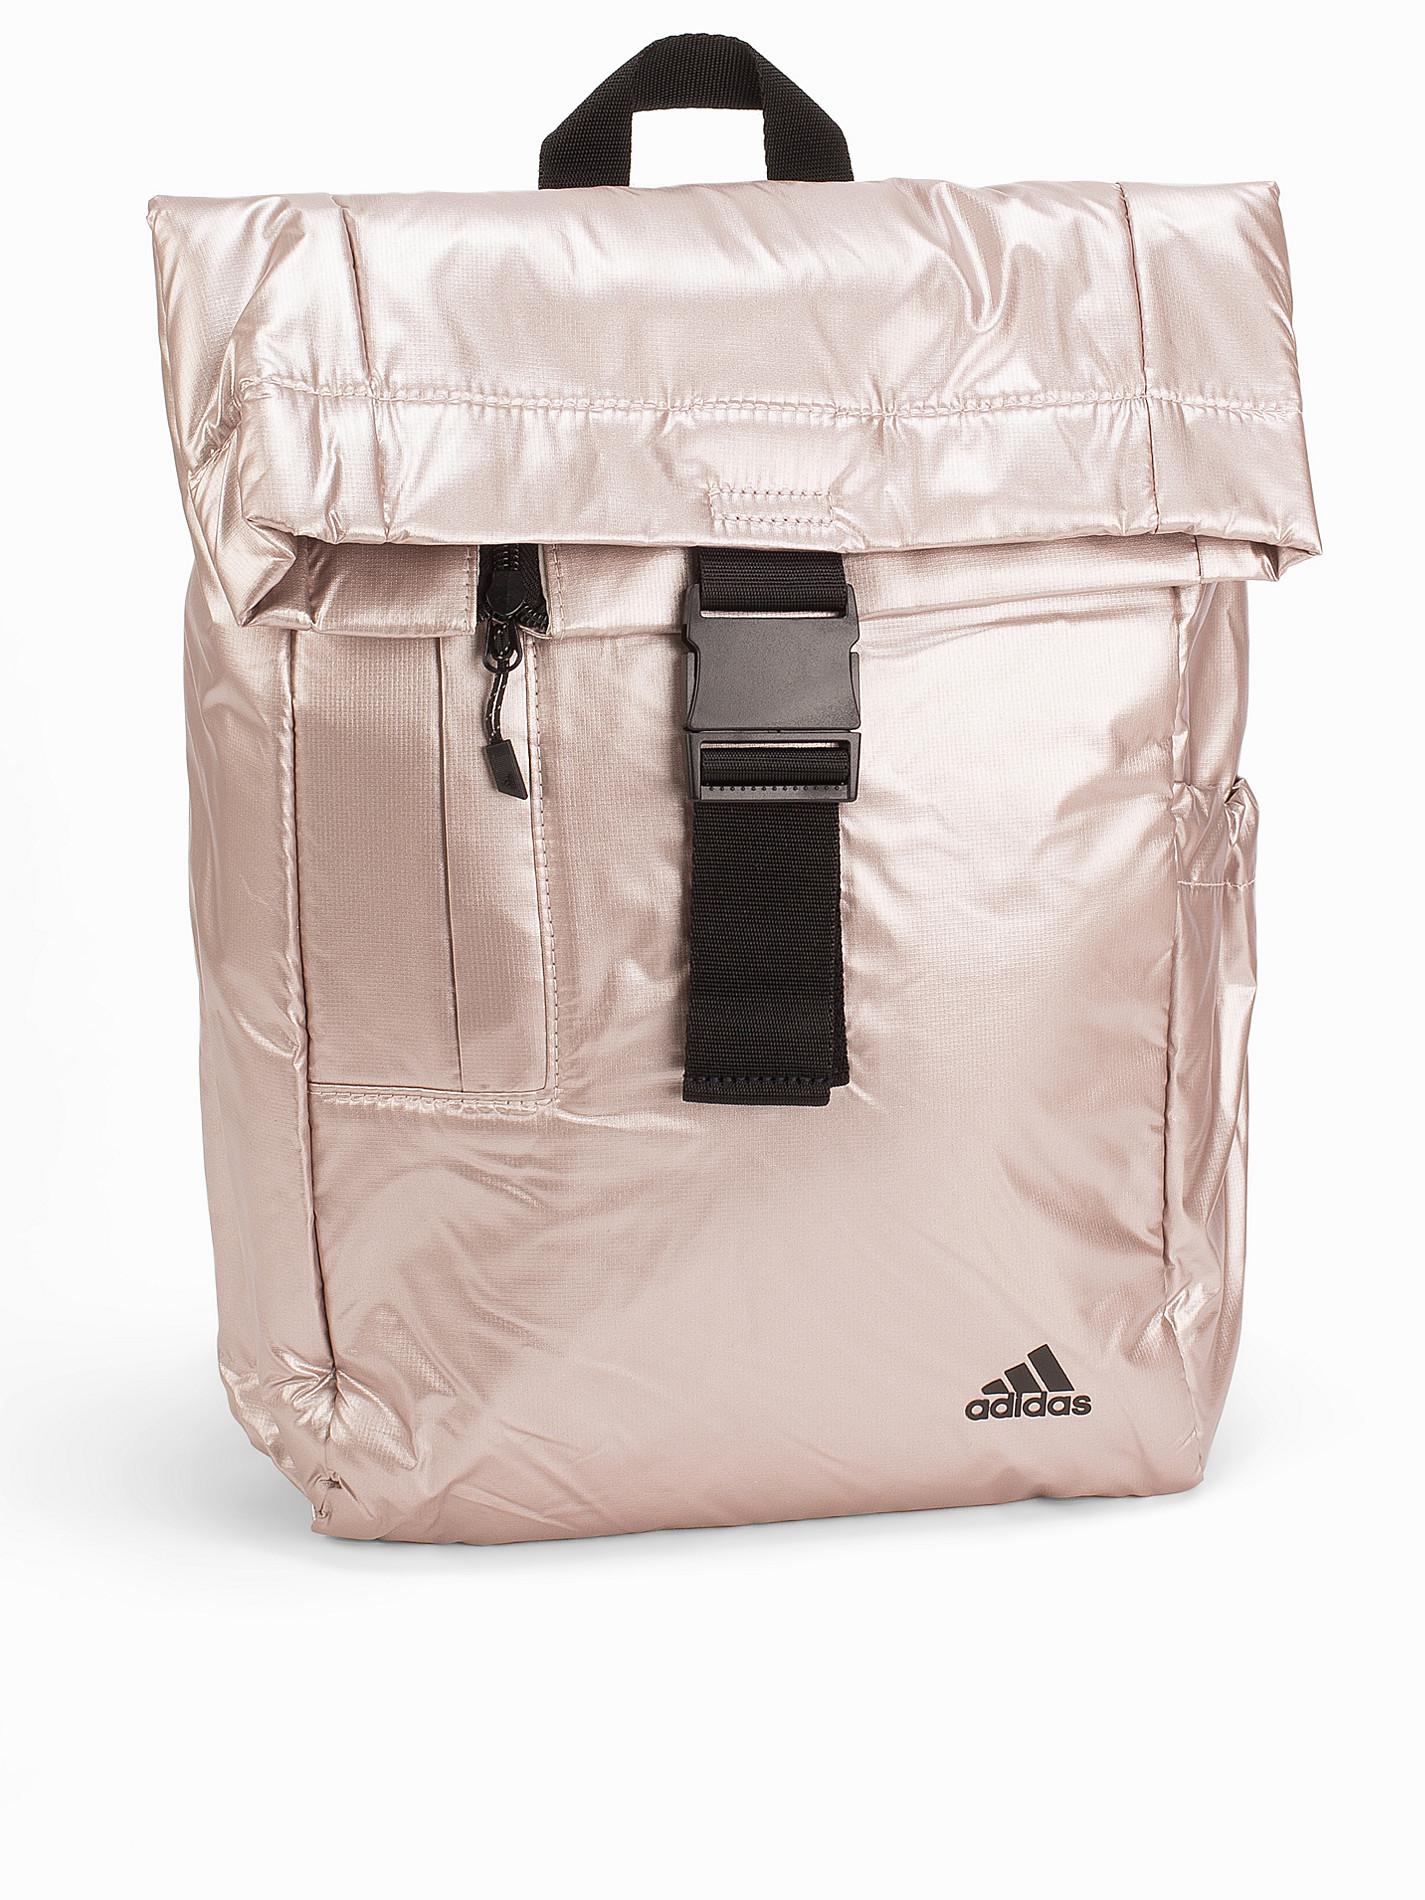 adidas_ryggsack_metallic